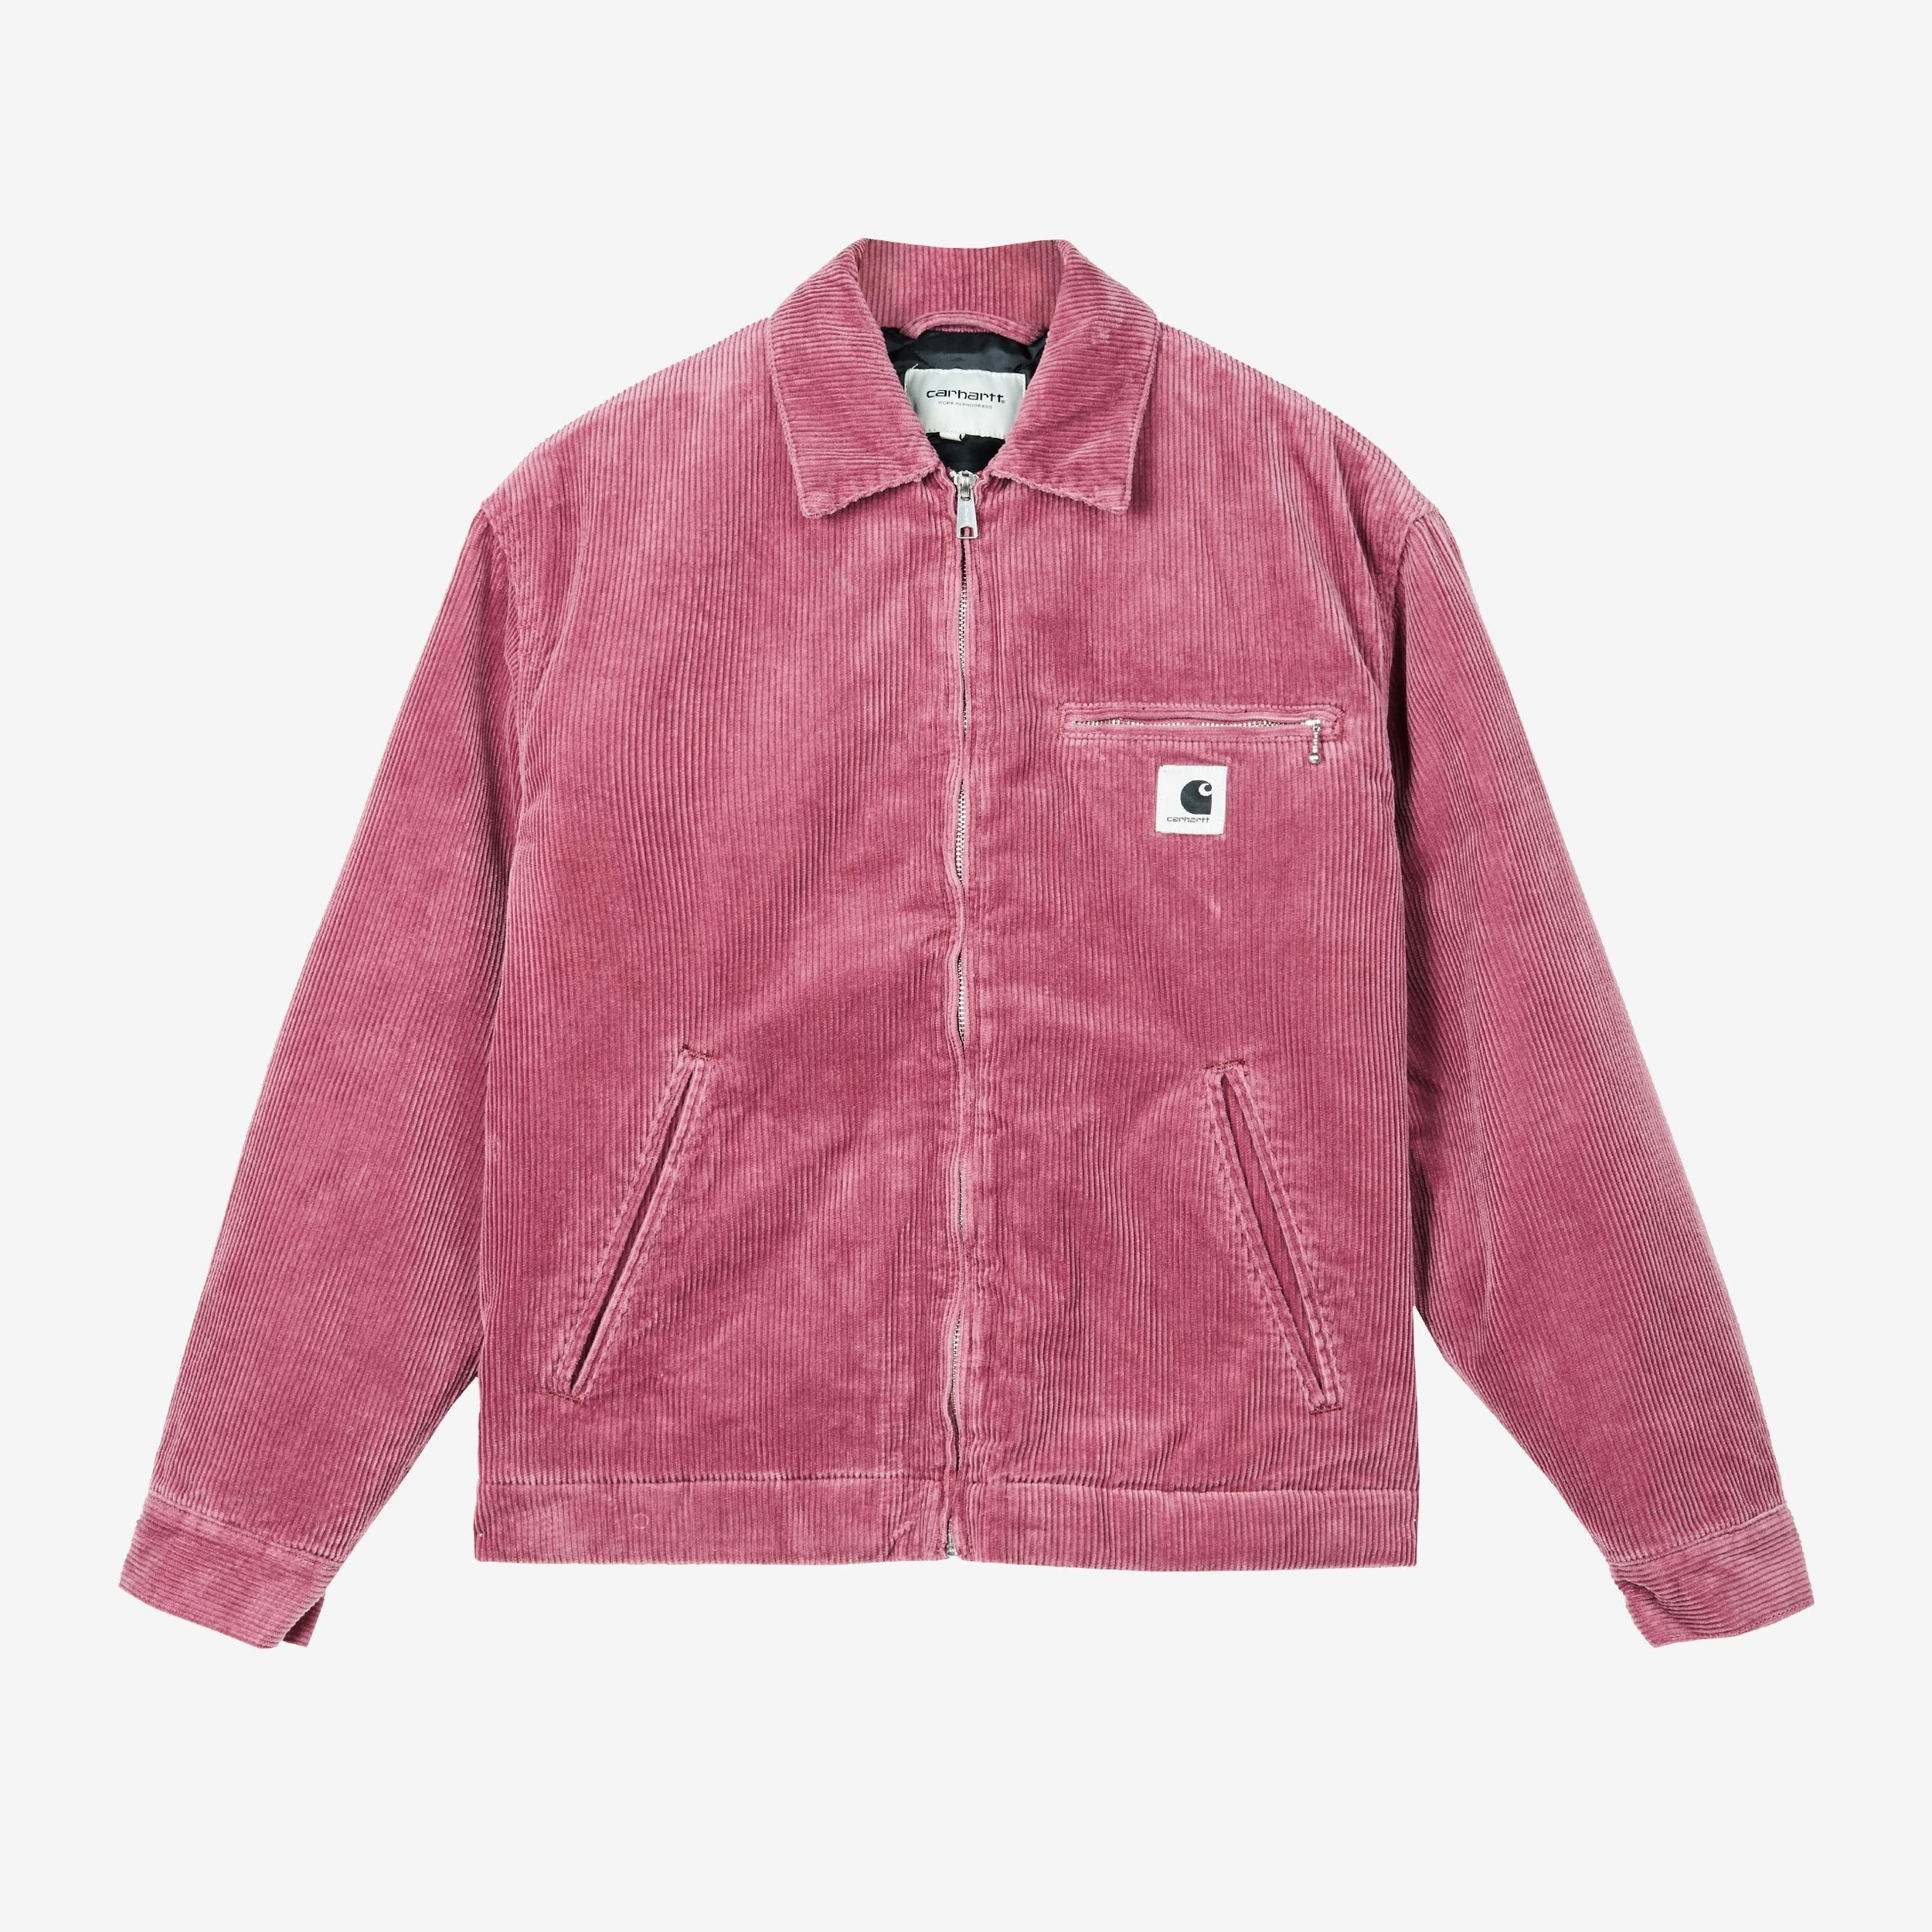 online retailer 97a8c de014 Carhartt W Great Detroit Jacket - I027388.05d.02 ...